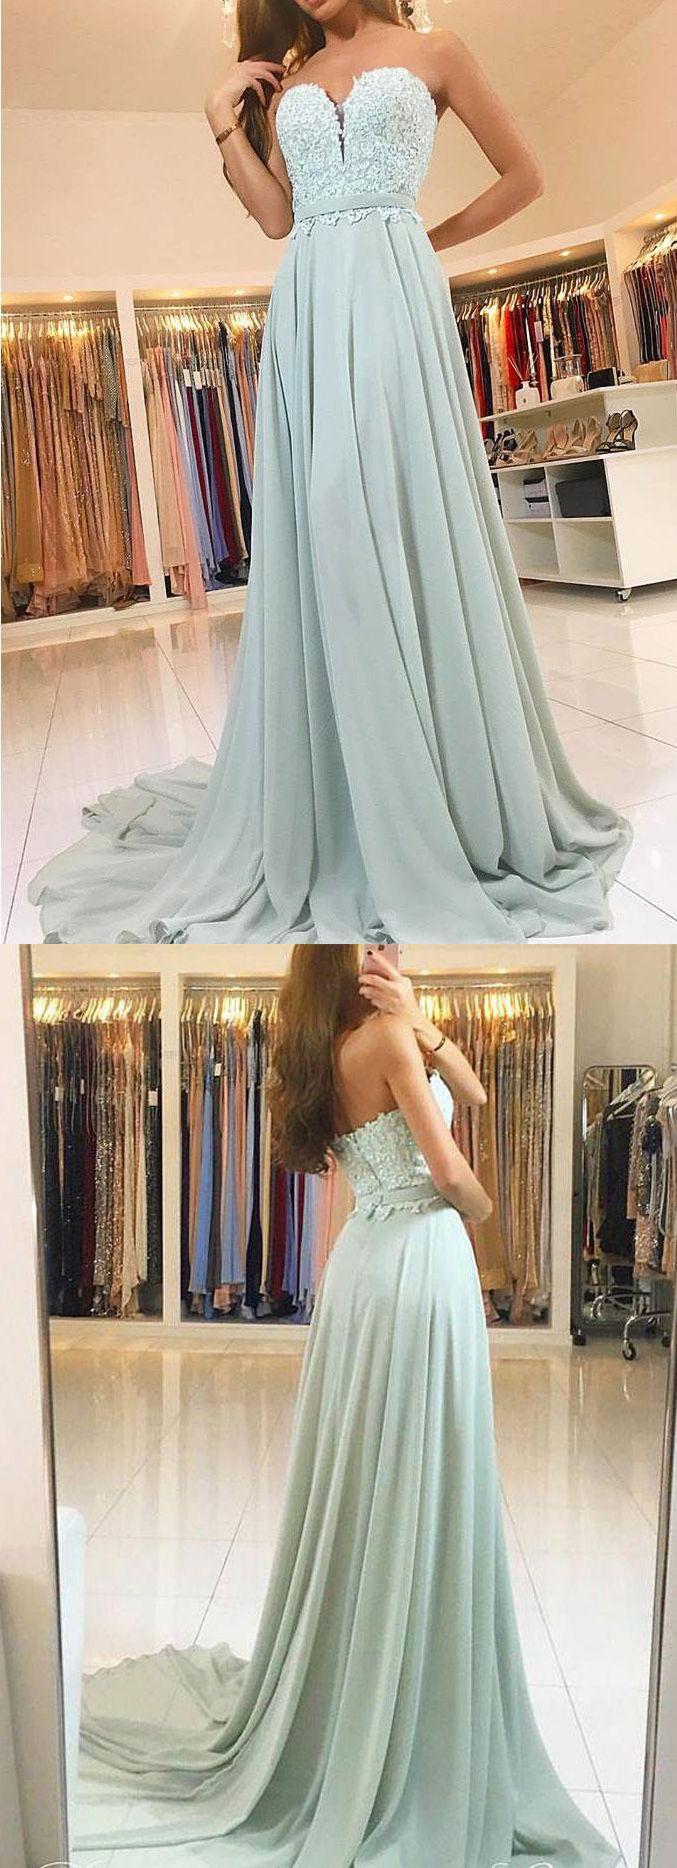 Gorgeous Strapless Lace Chiffon Long Prom Dress Aqua Formal Evening Gown Elegant Prom Gown Aqua Wedding Party Dress #dress #gown #prom #prom2018 #homecoming #formaldress #formalgown #weddingparty #promdress #promgown #evening #eveningdress #eveninggown #fashion #aqua